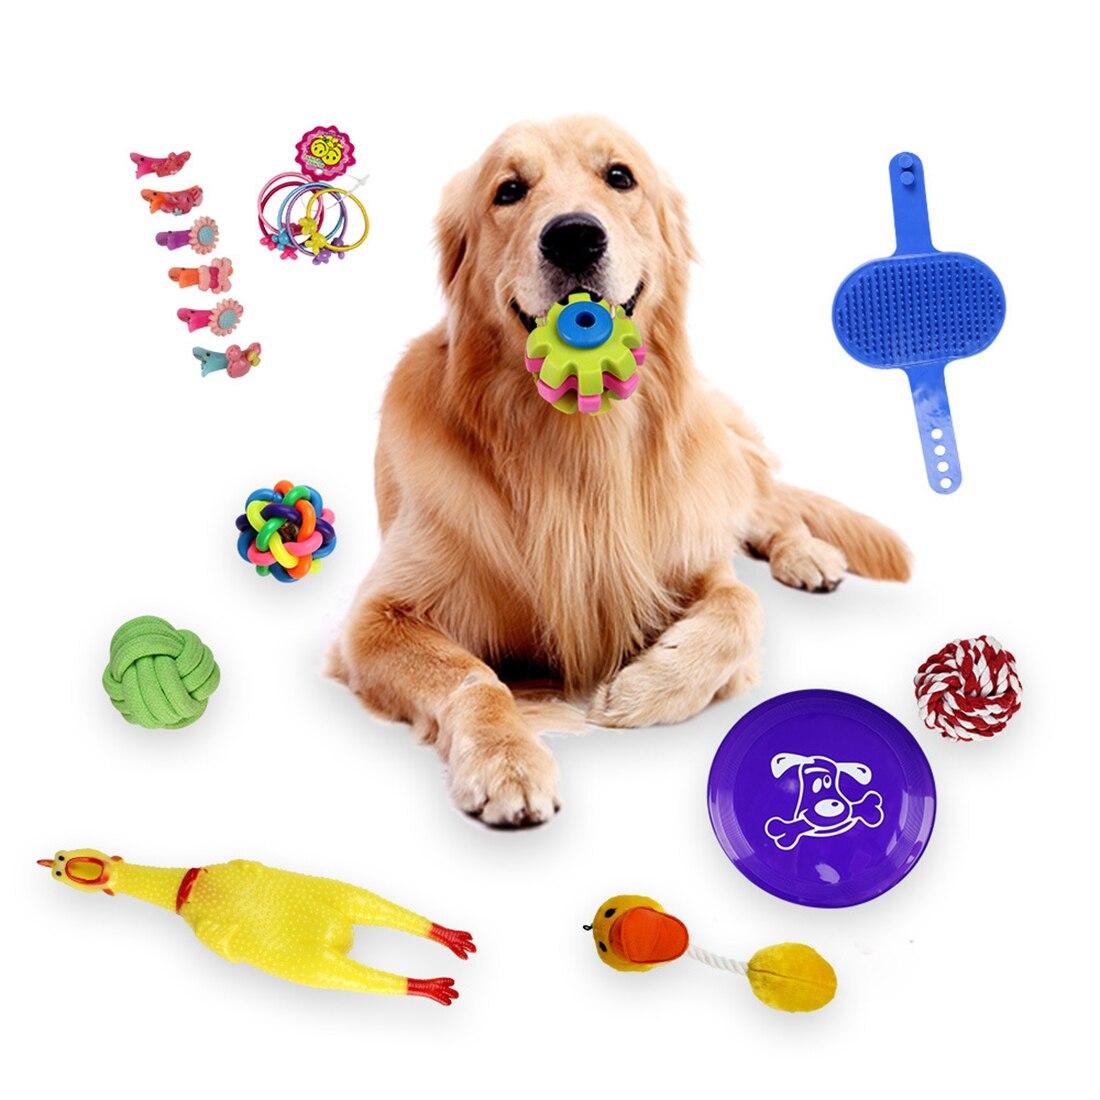 18Pcs Dog Teaser Squeak Toys Interesting Molar Toys for Pets Training